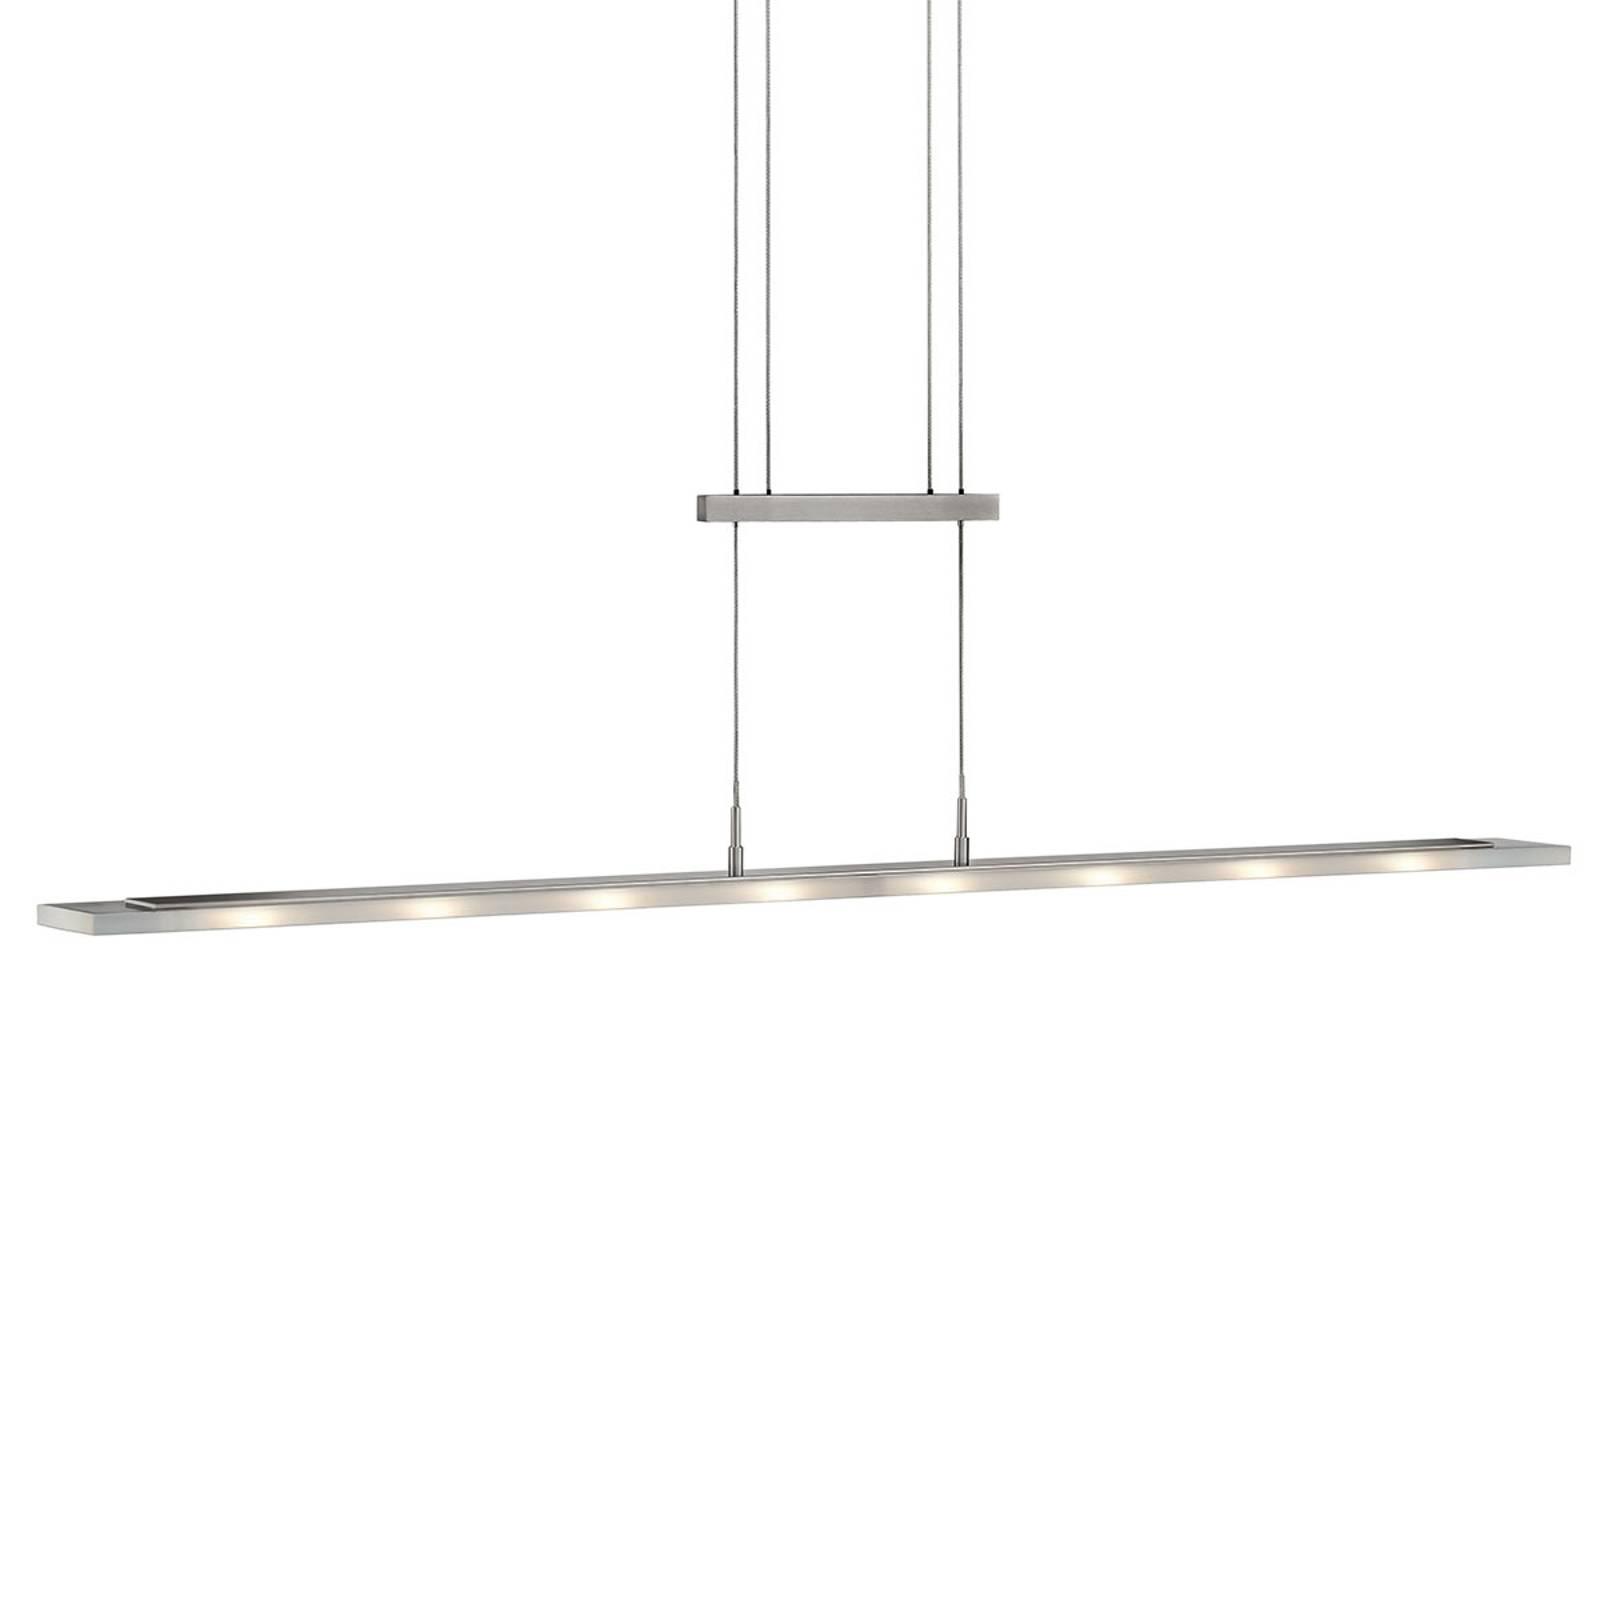 LED hanglamp Mia, dimbaar, nikkel mat